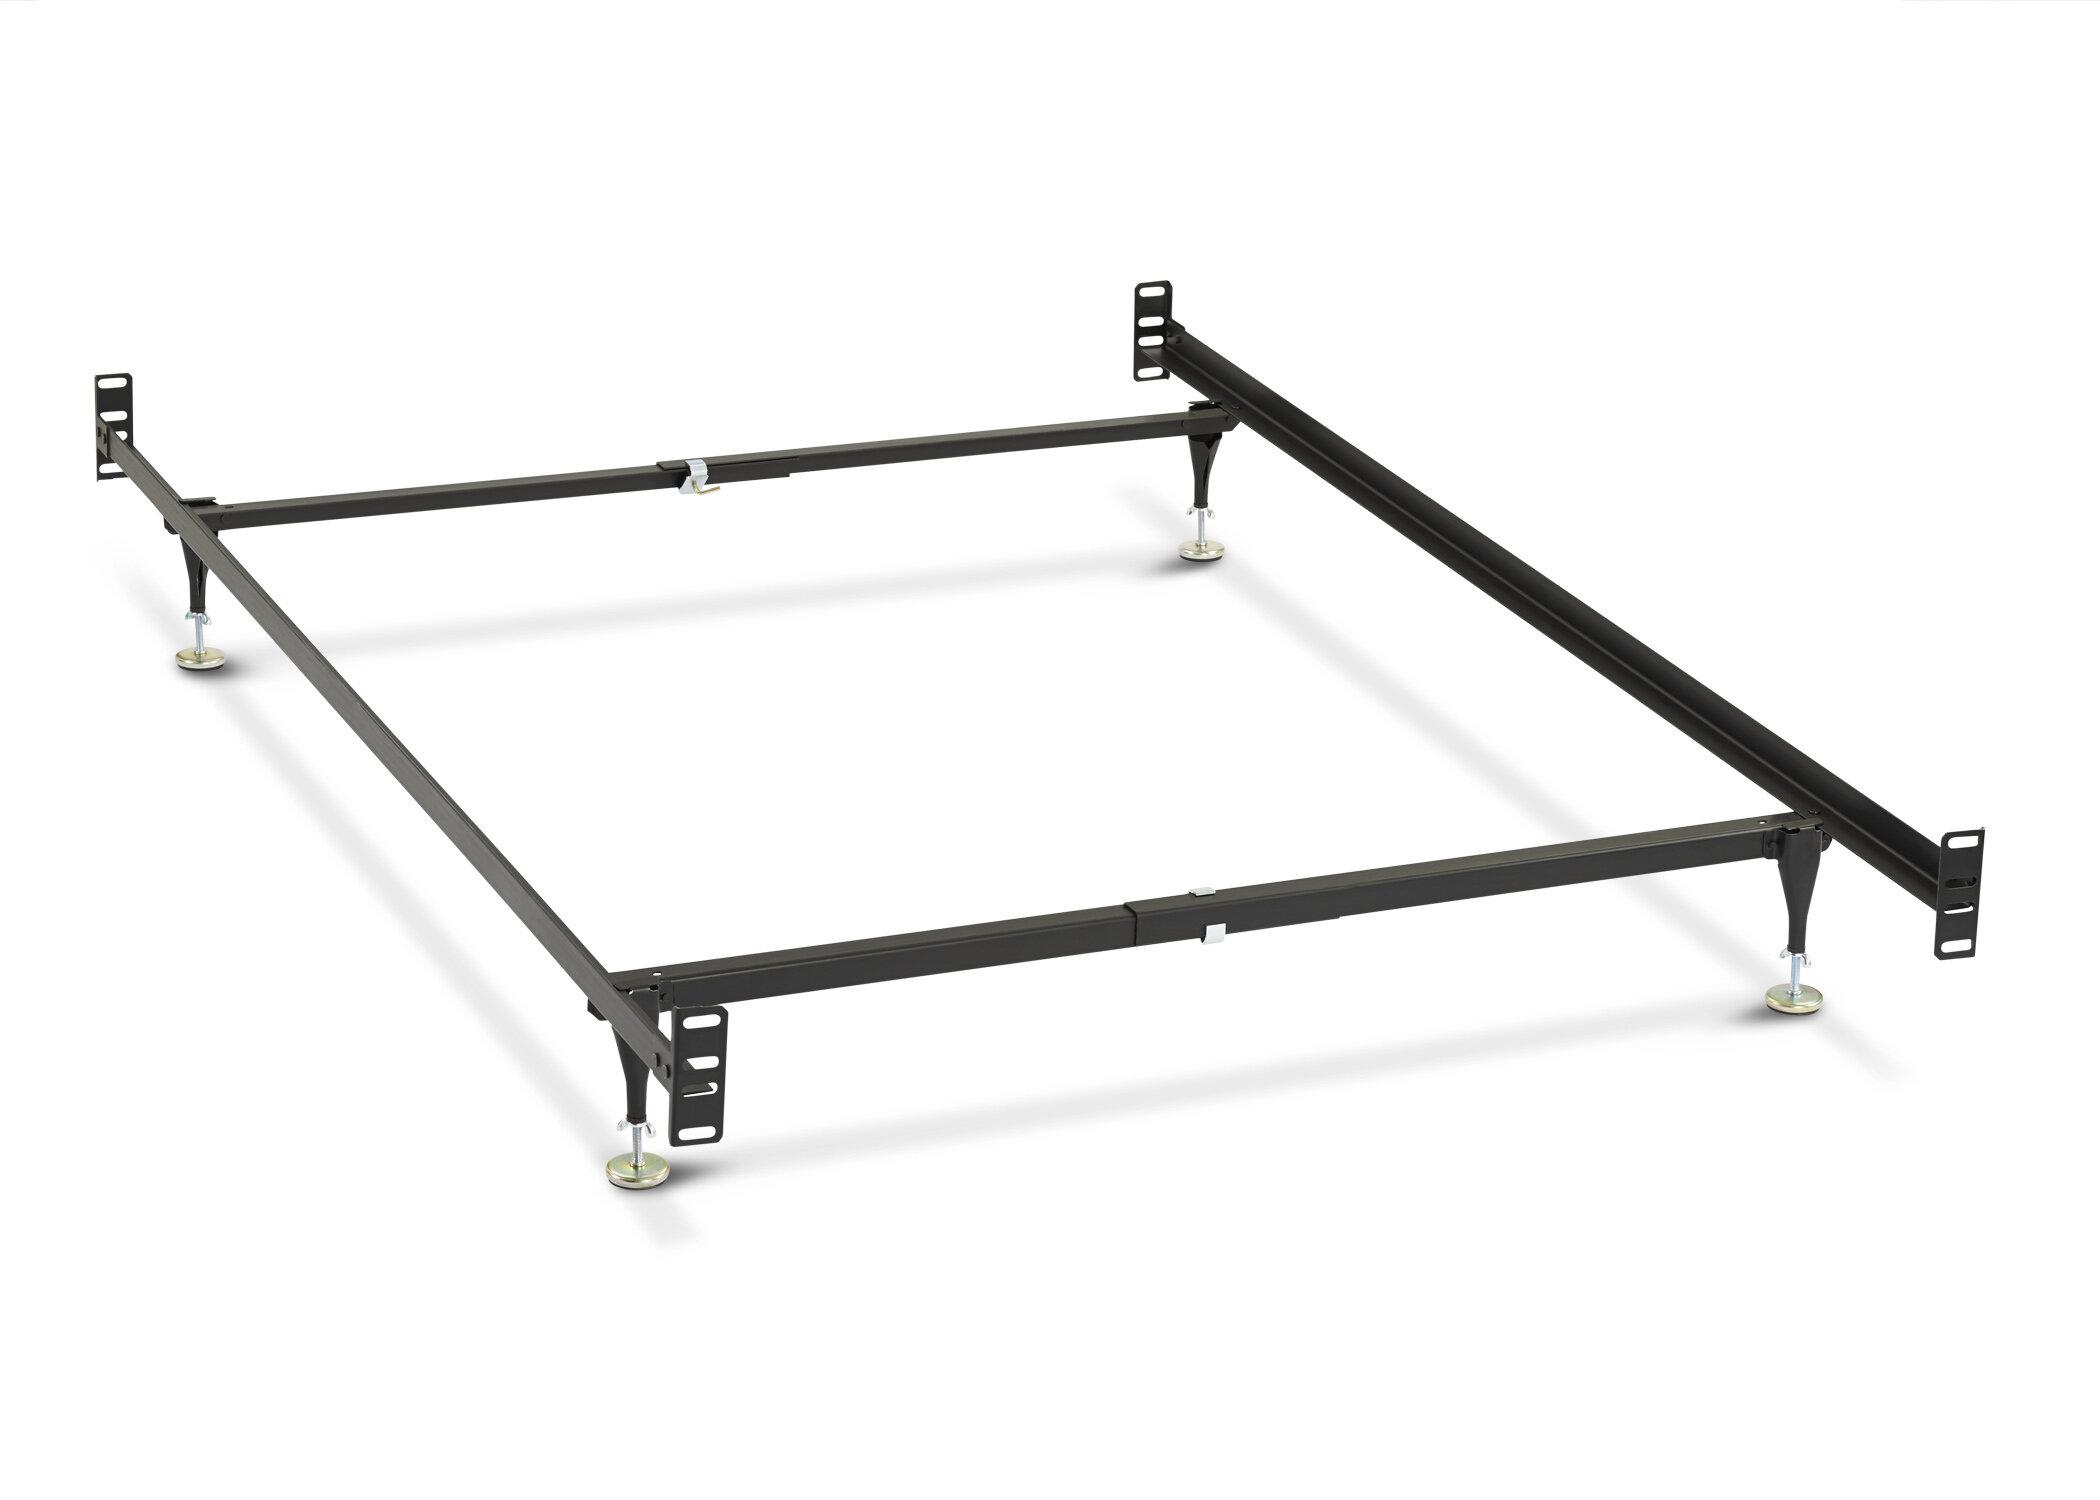 Fisher Price Full Size Metal Bed Frame Reviews Wayfair